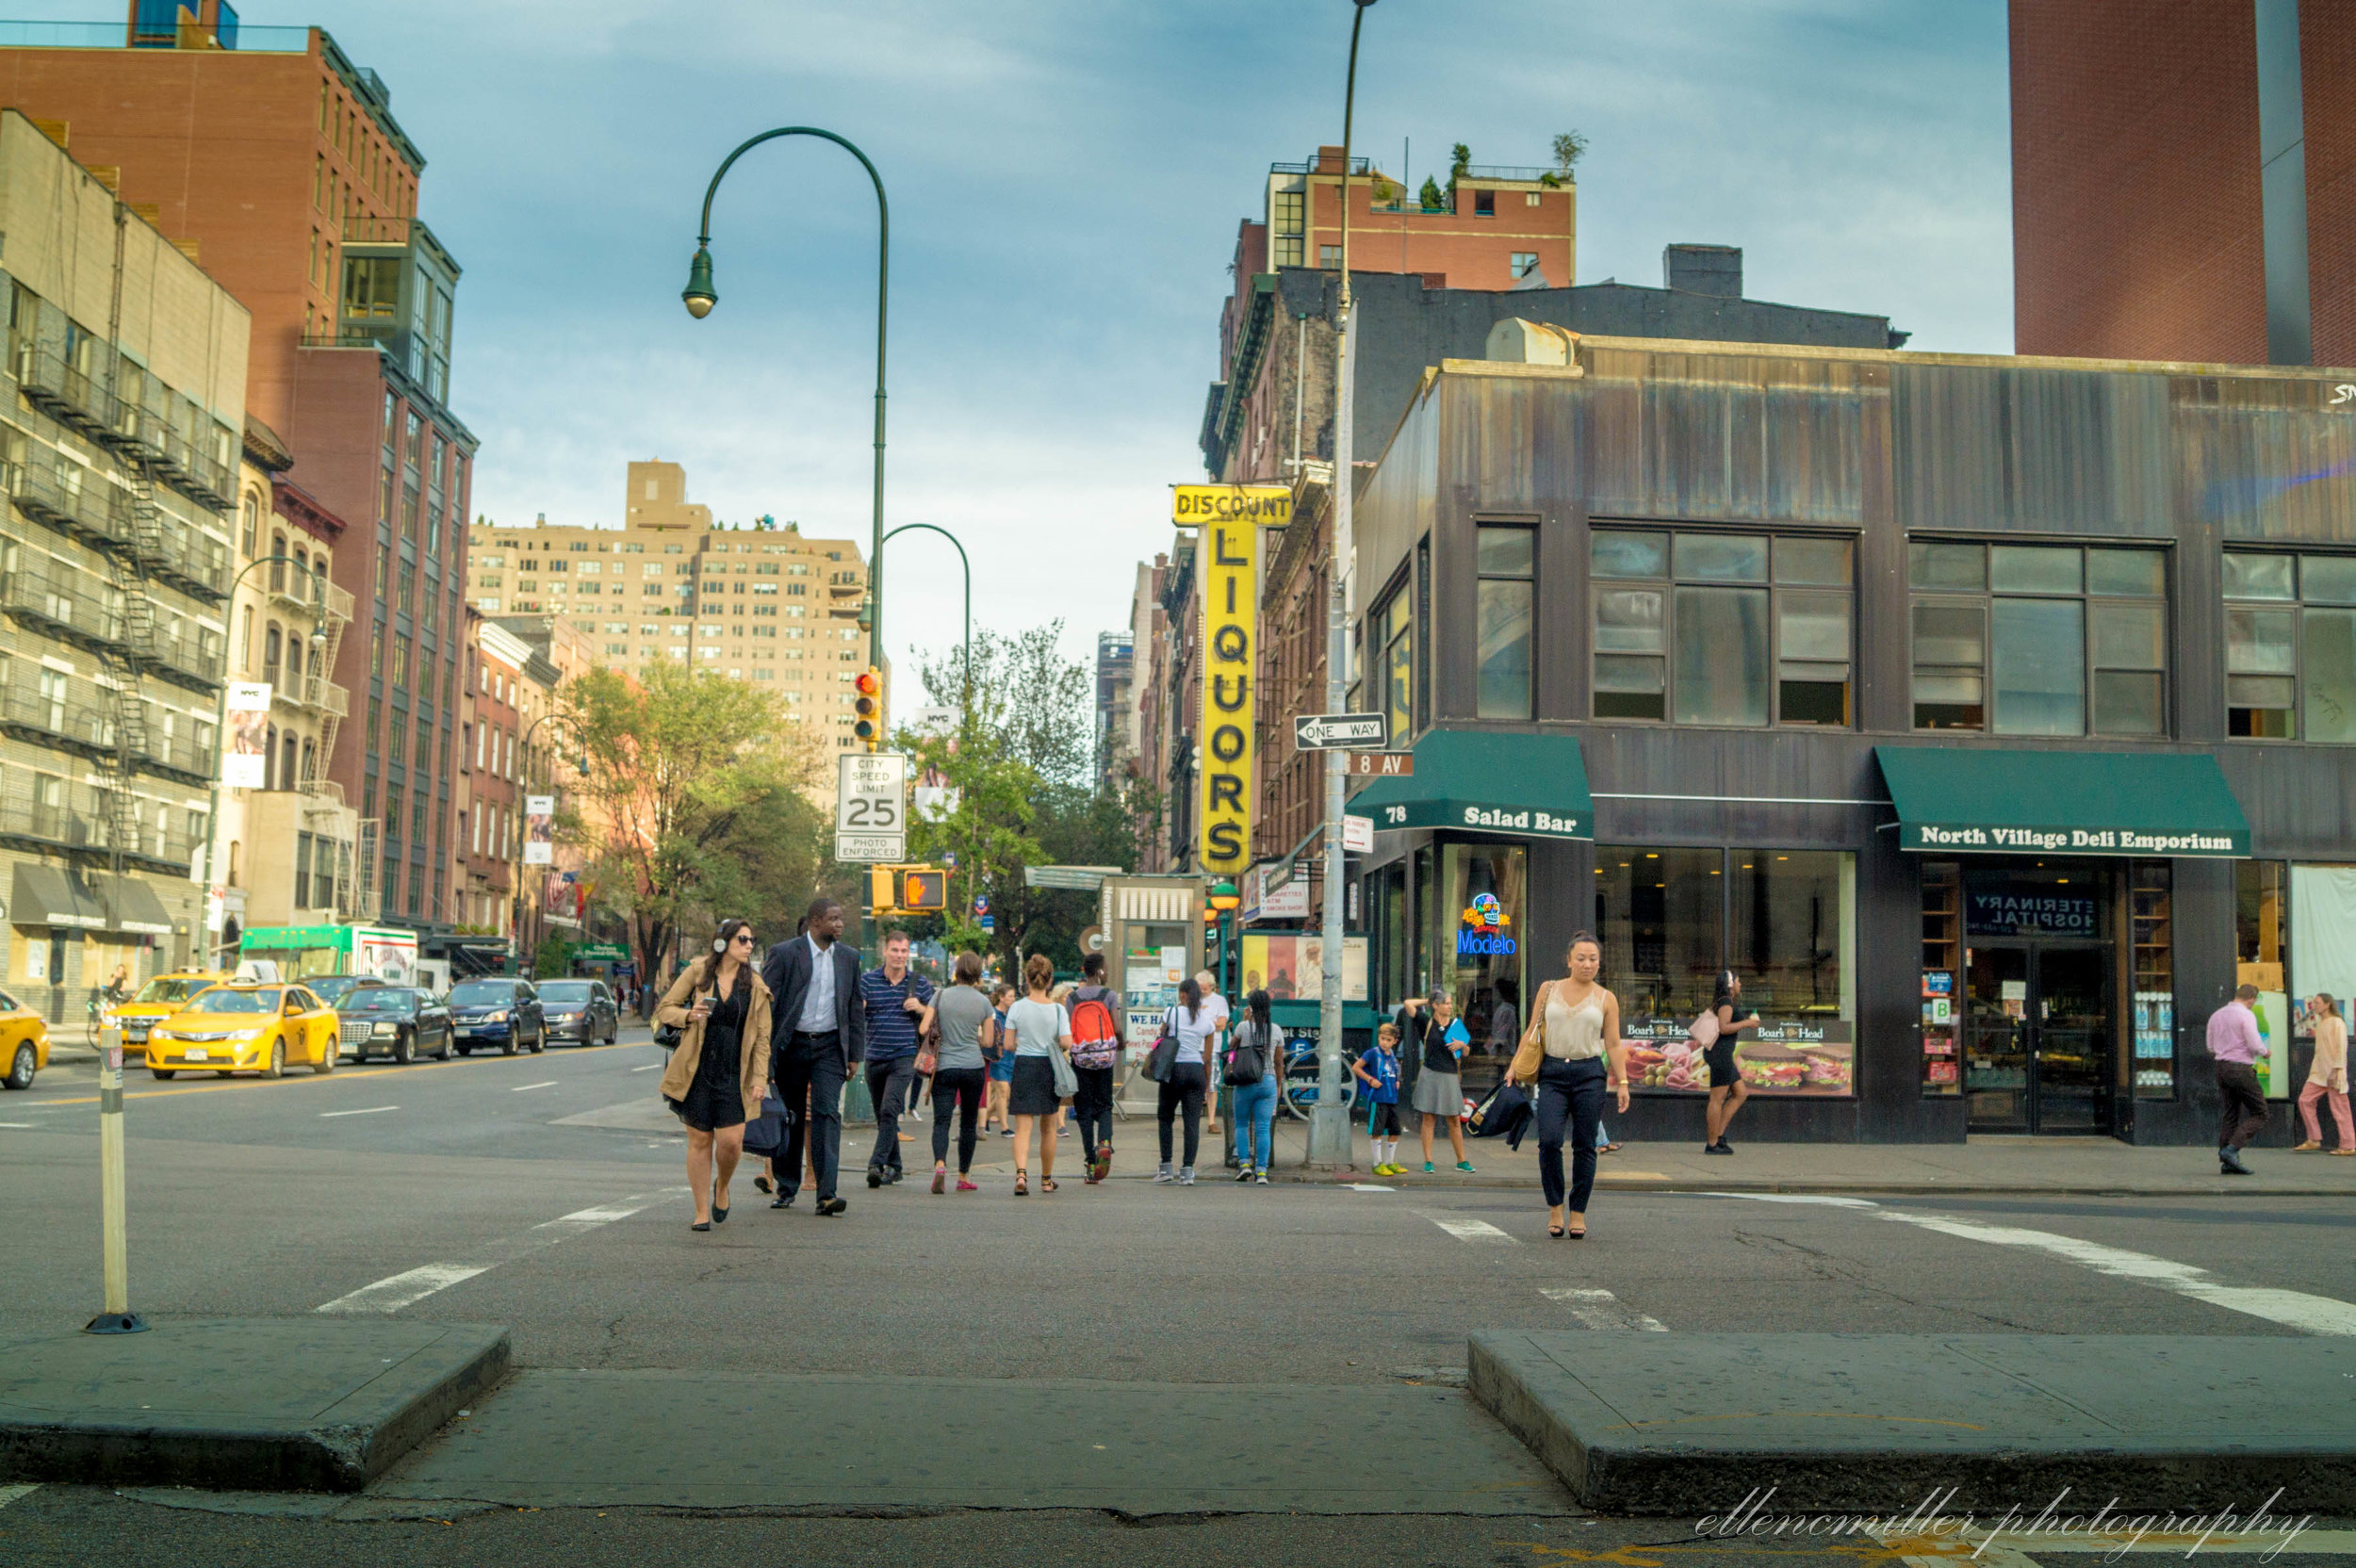 20160921-NYC-68.jpg